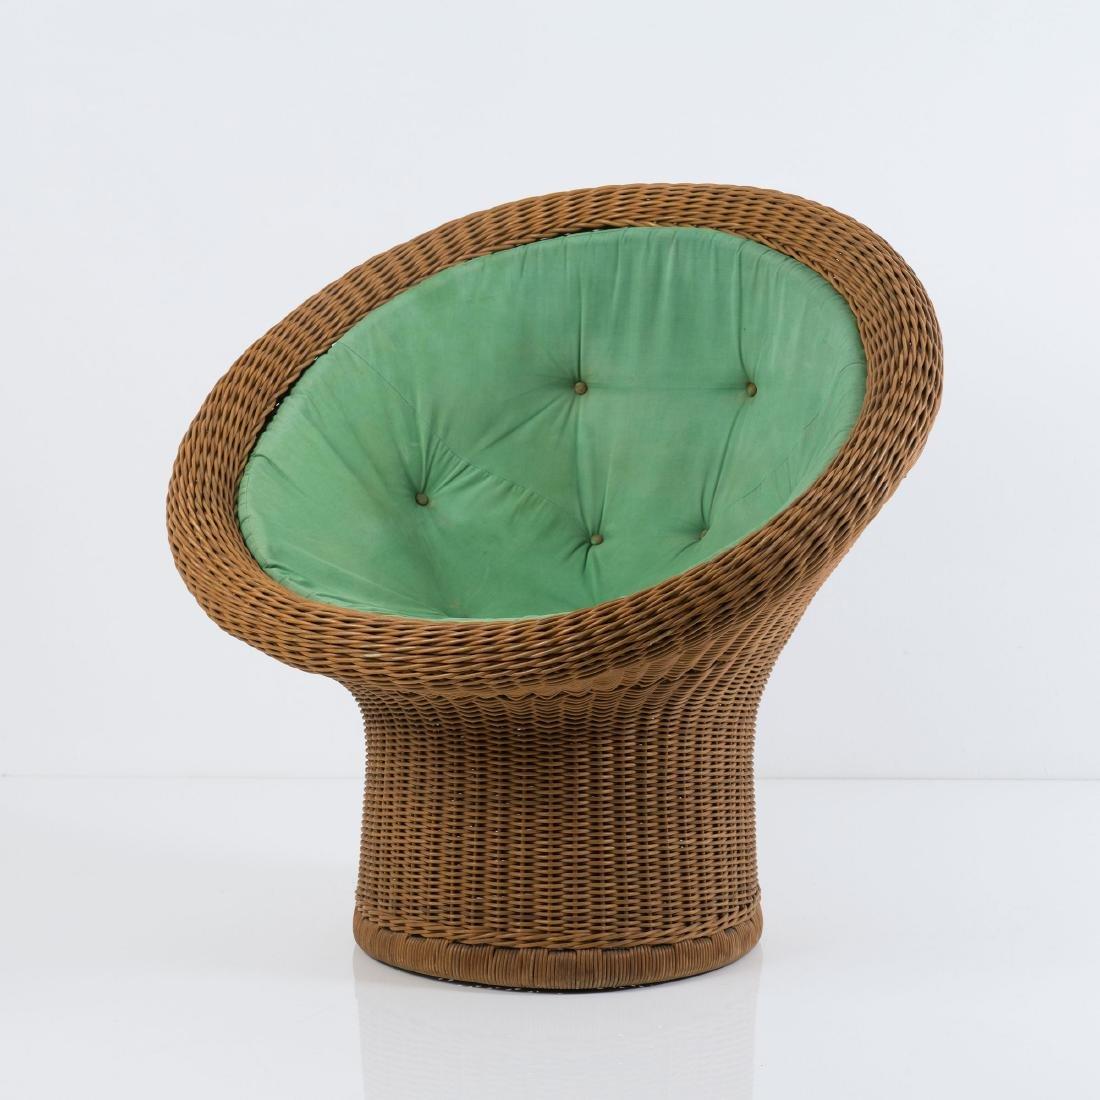 'E 11' wicker chair, 1967/68 - 2